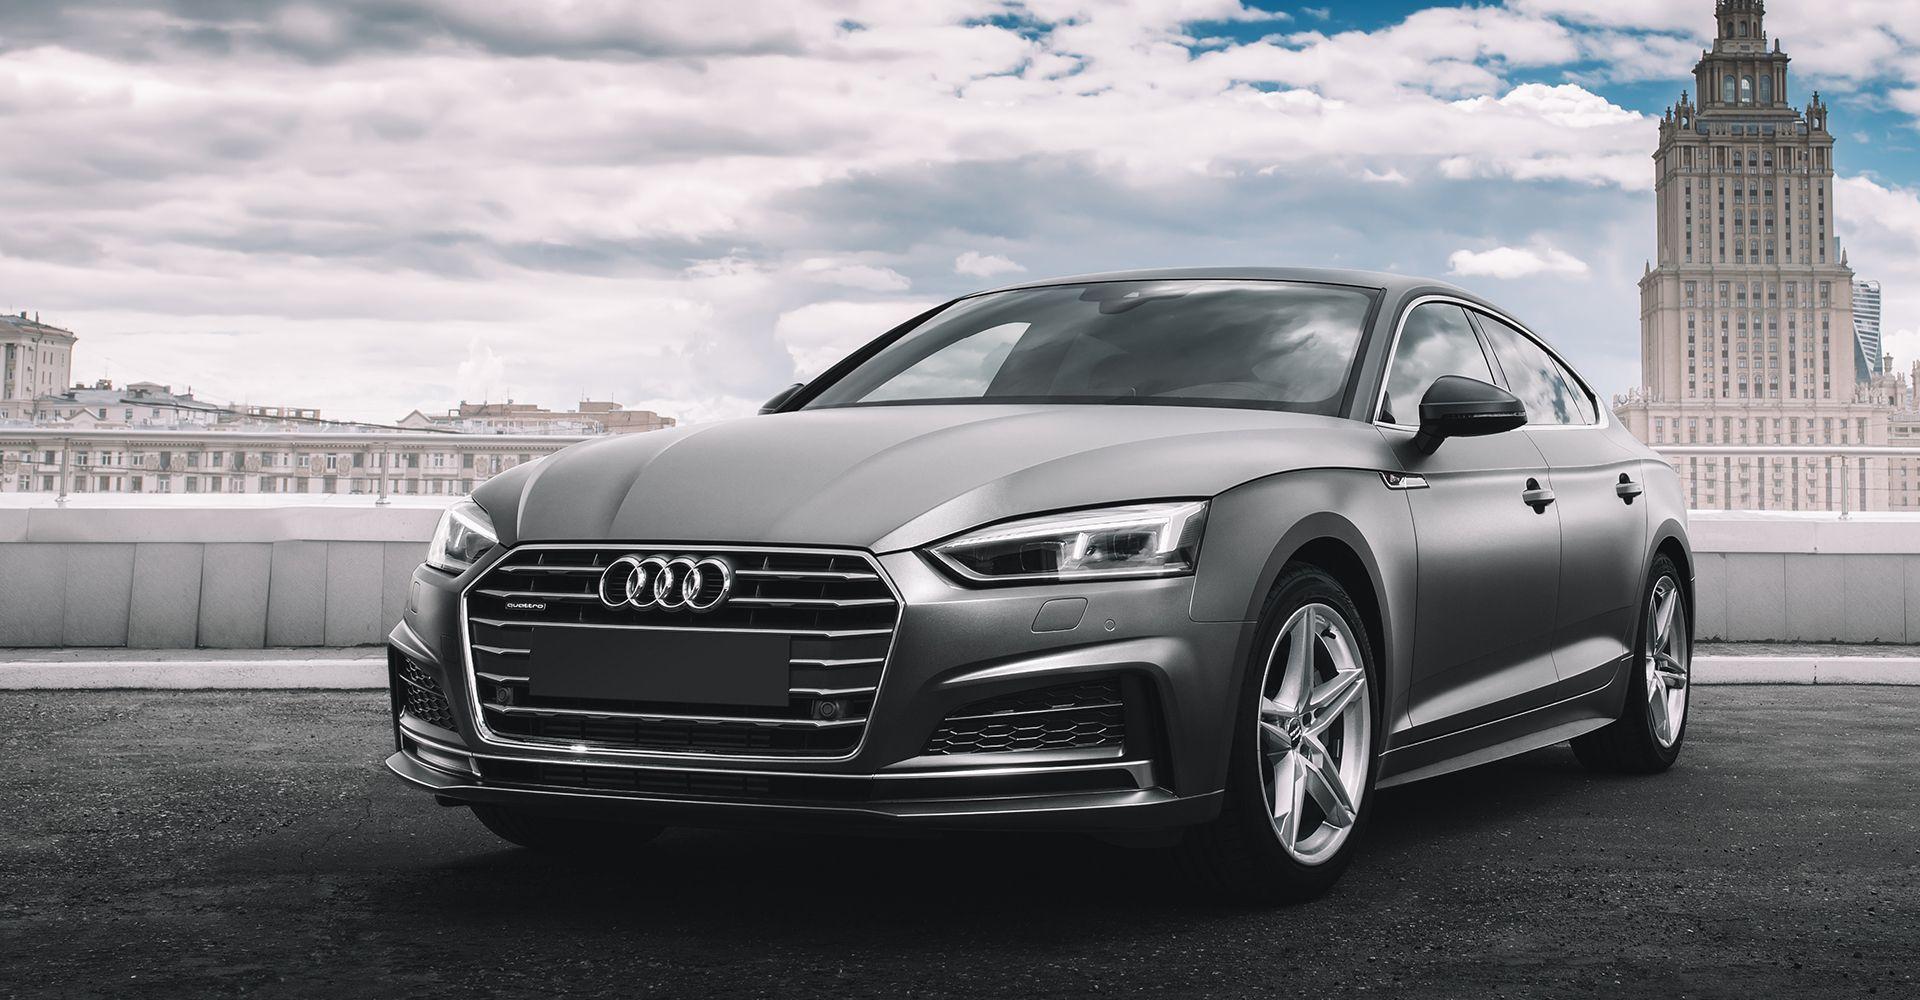 Front side photo of Audi car - Cobalt Motors Ltd